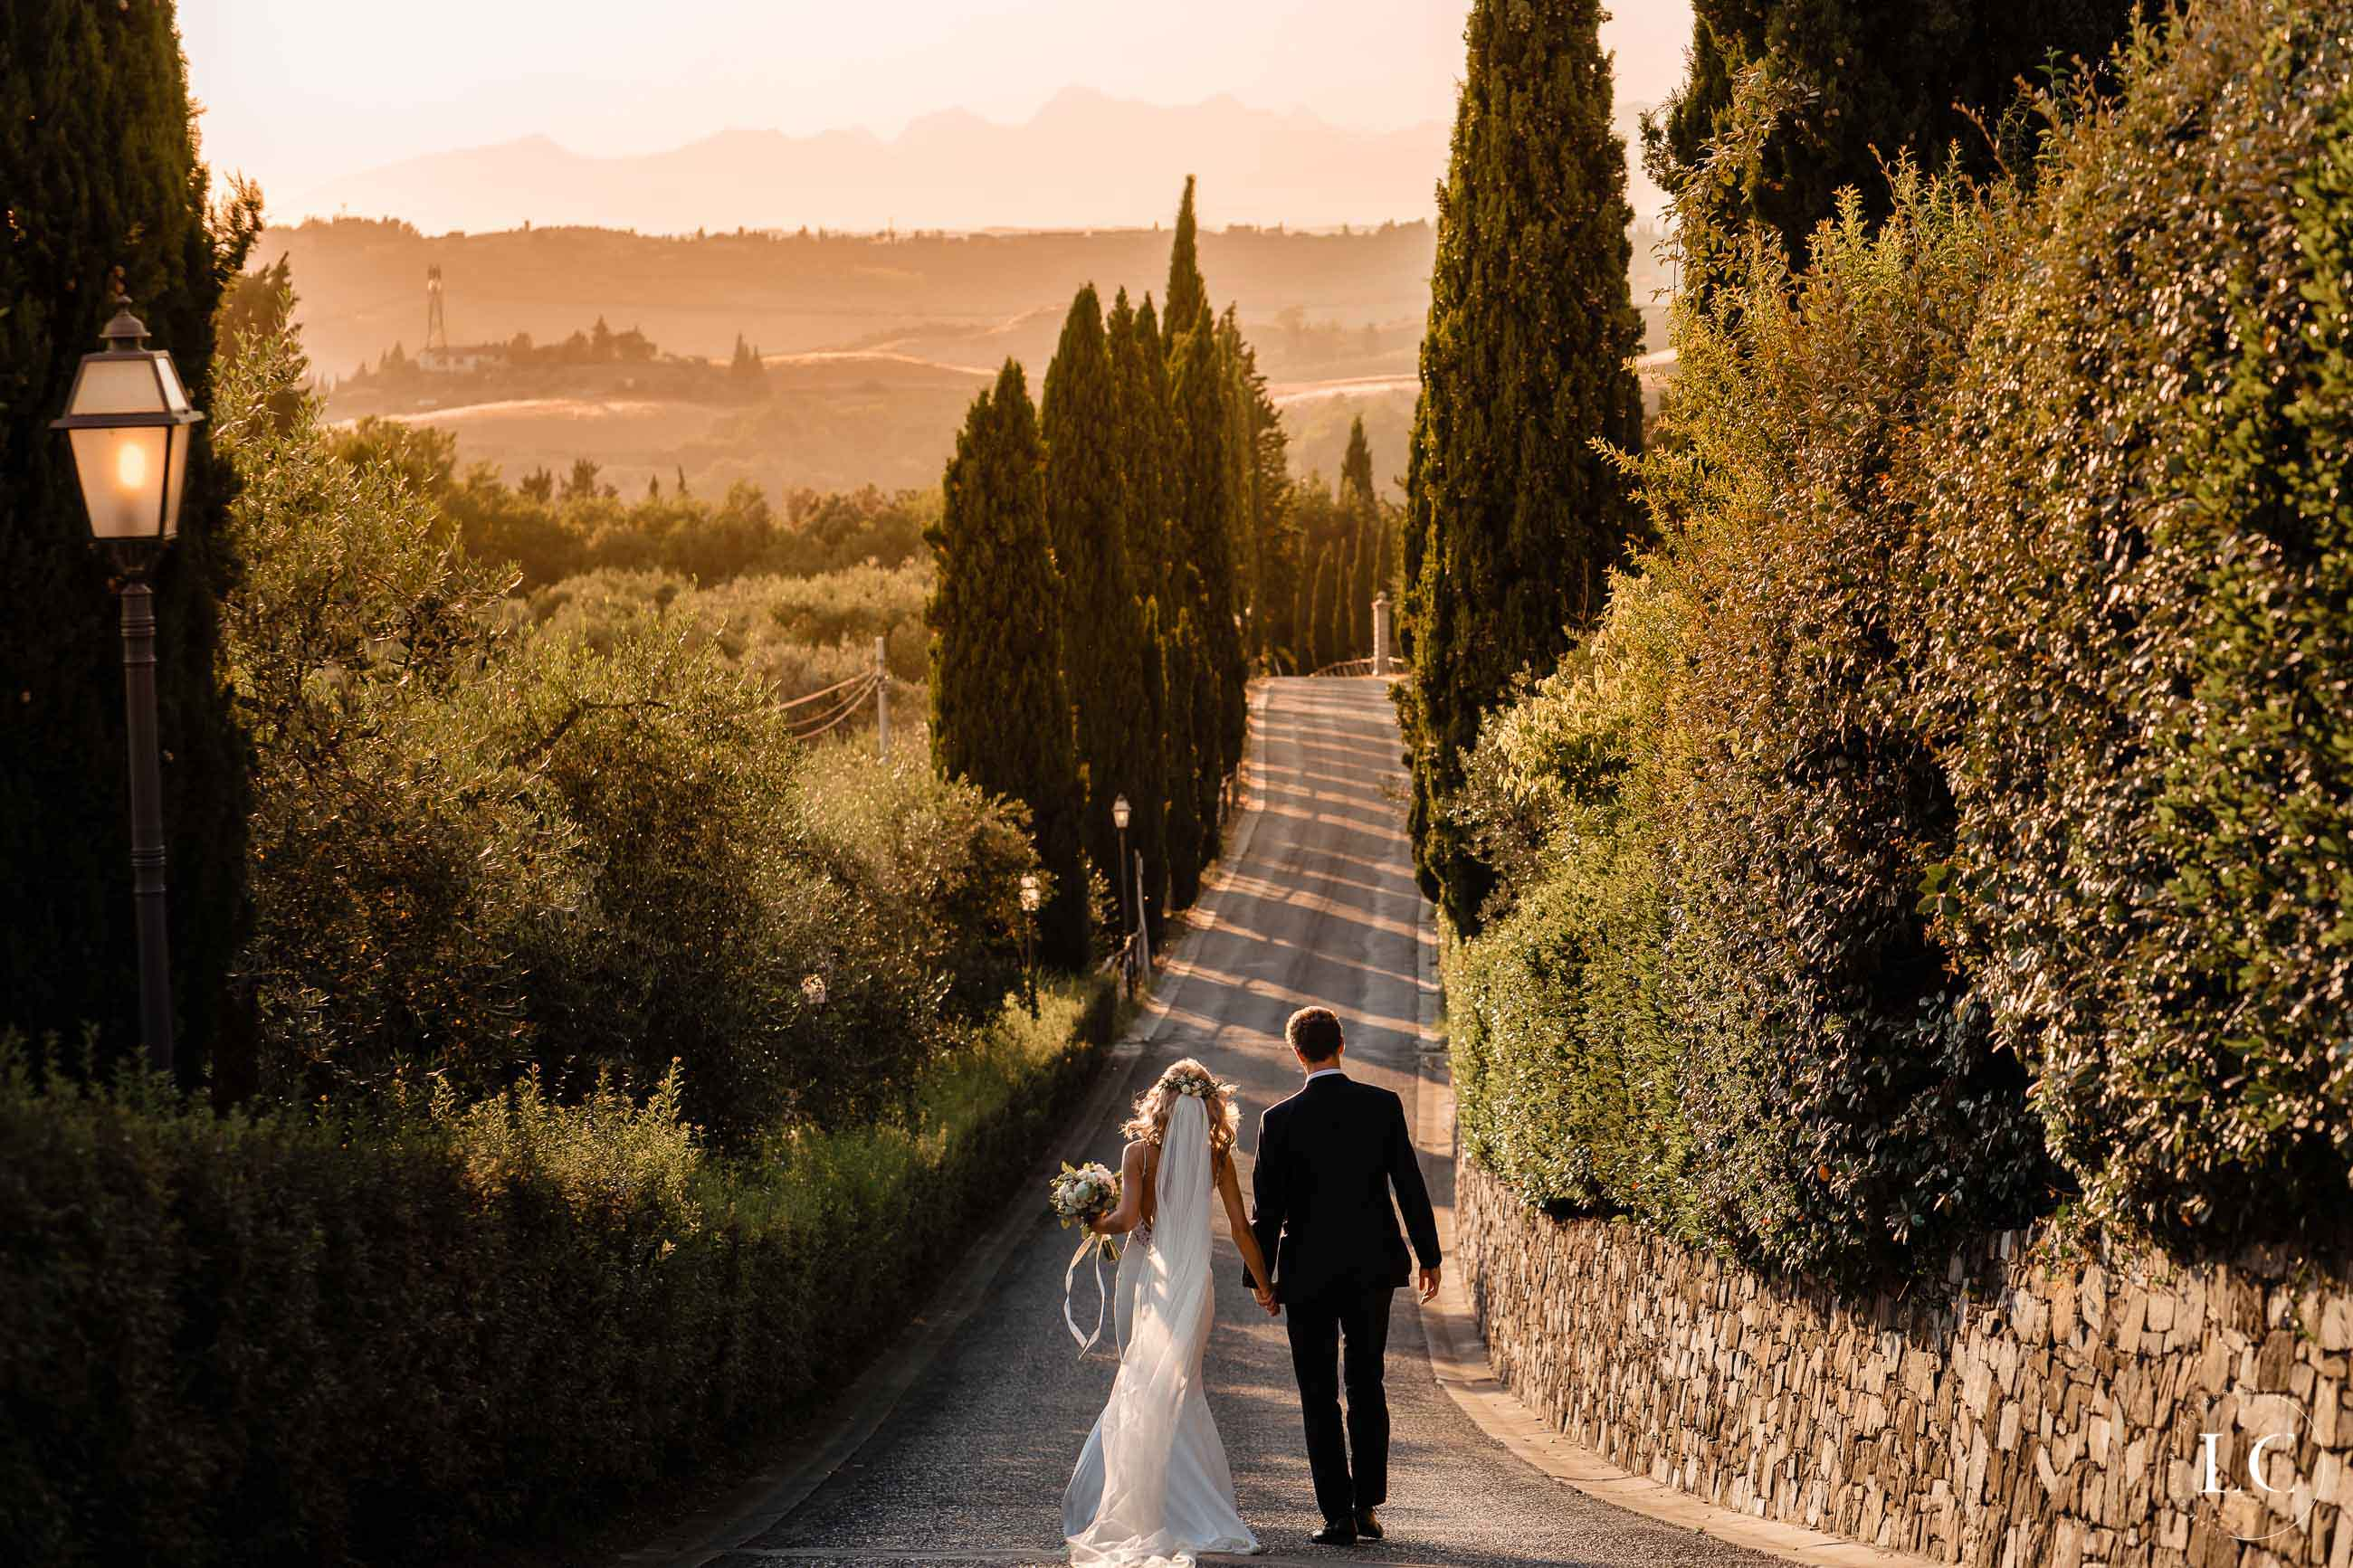 Newly weds walking at sunset